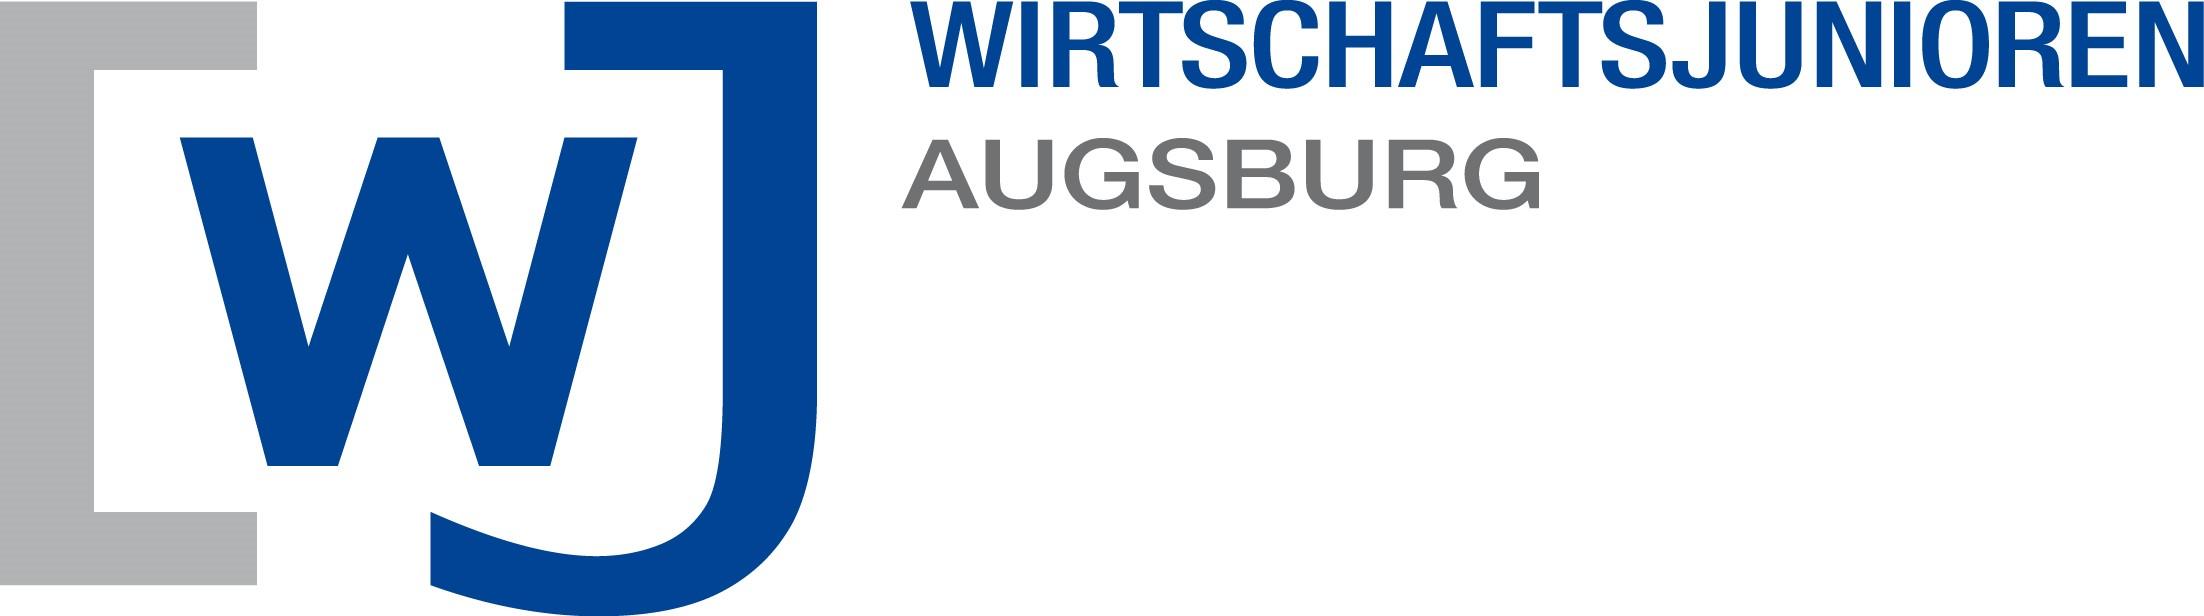 Logo_Wirtschaftsjunioren Augsburg e.V. c/o Thomas Weber